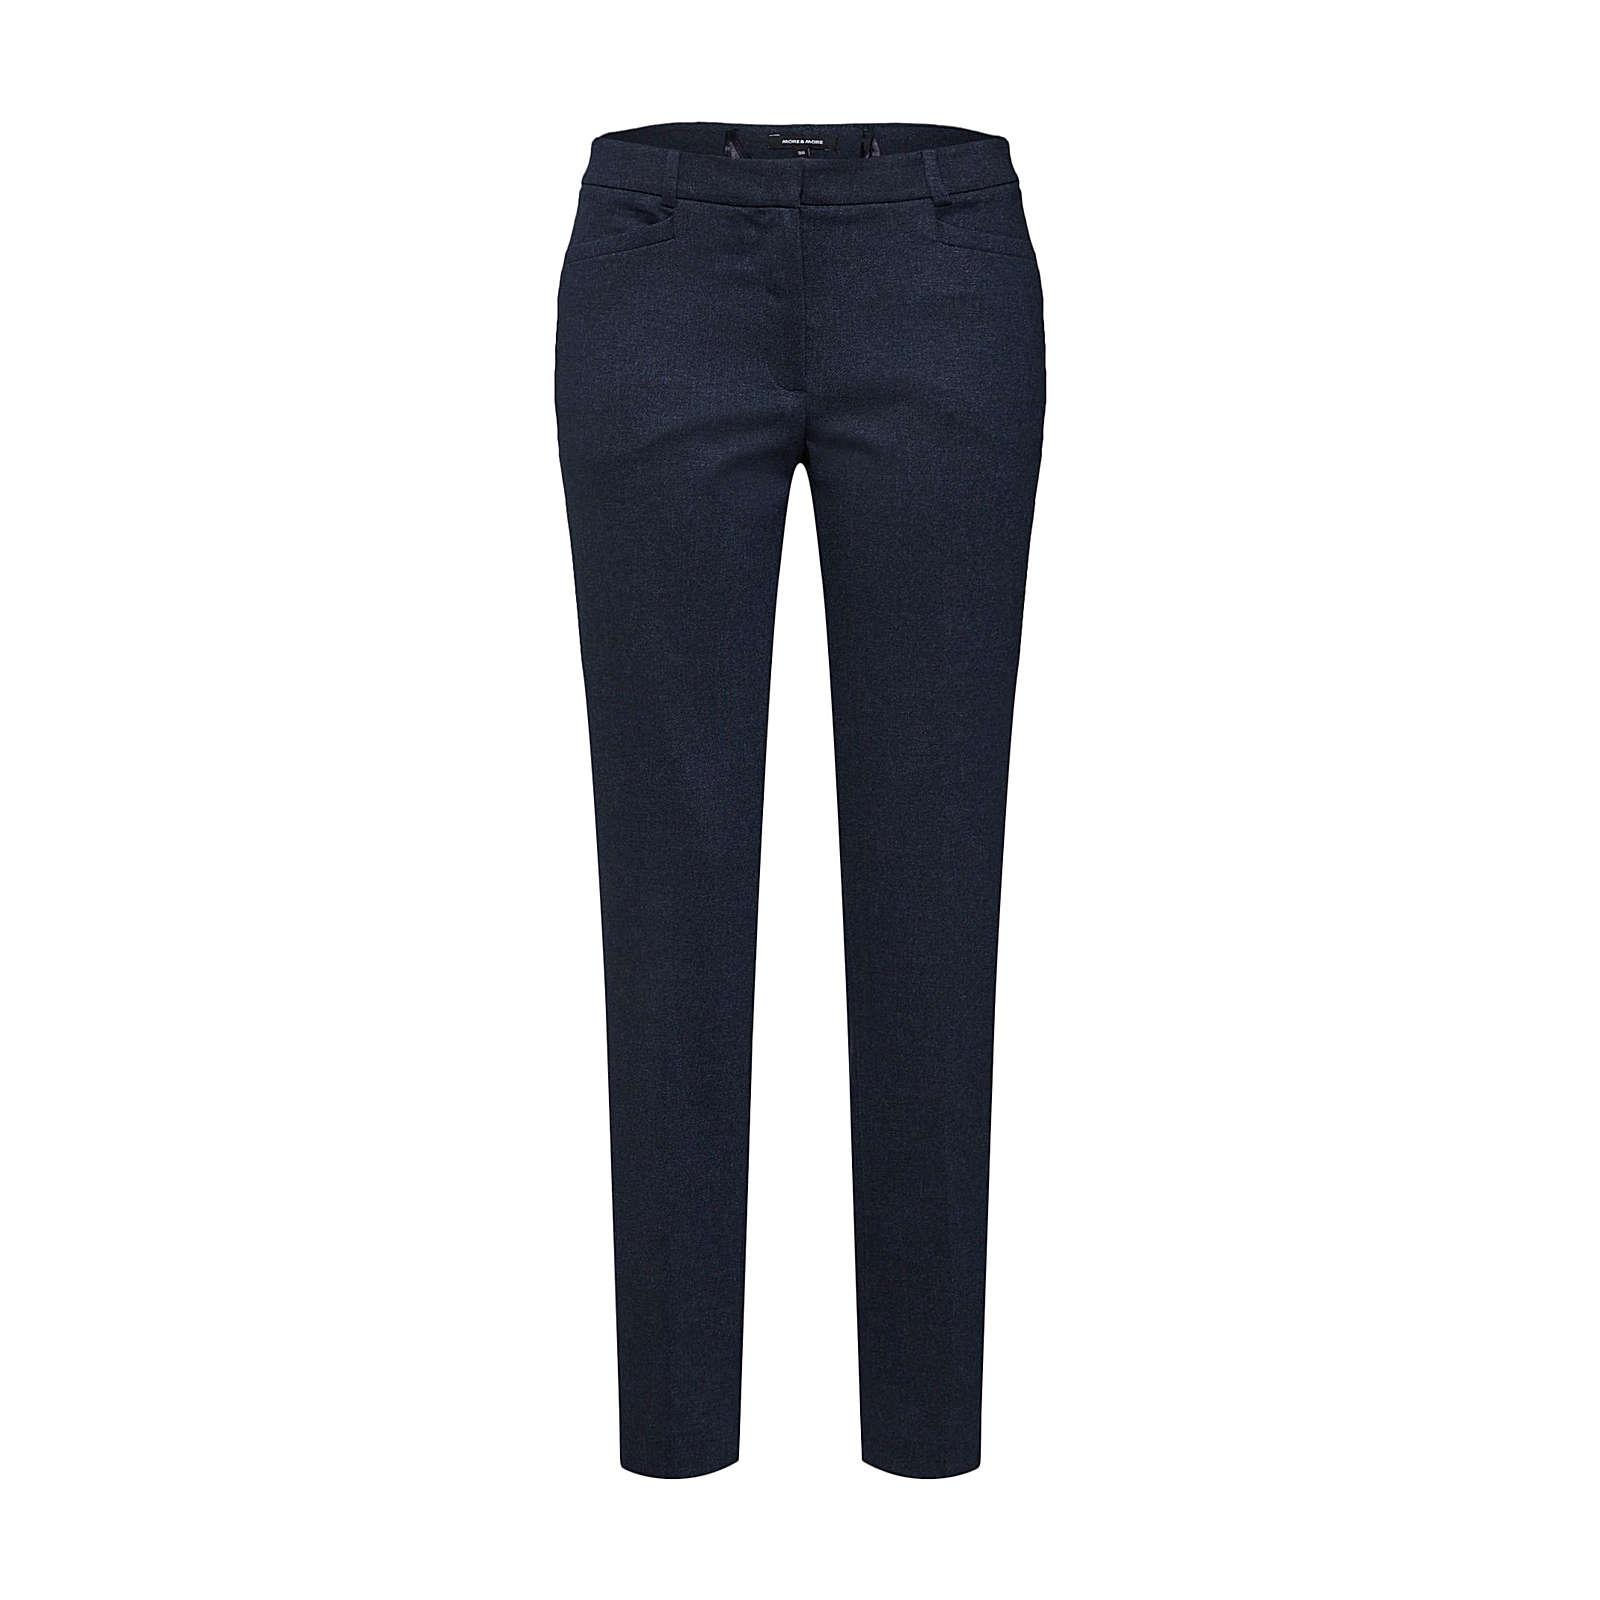 MORE & MORE Bügelfaltenhose 3/4-Hosen blau Damen Gr. 52